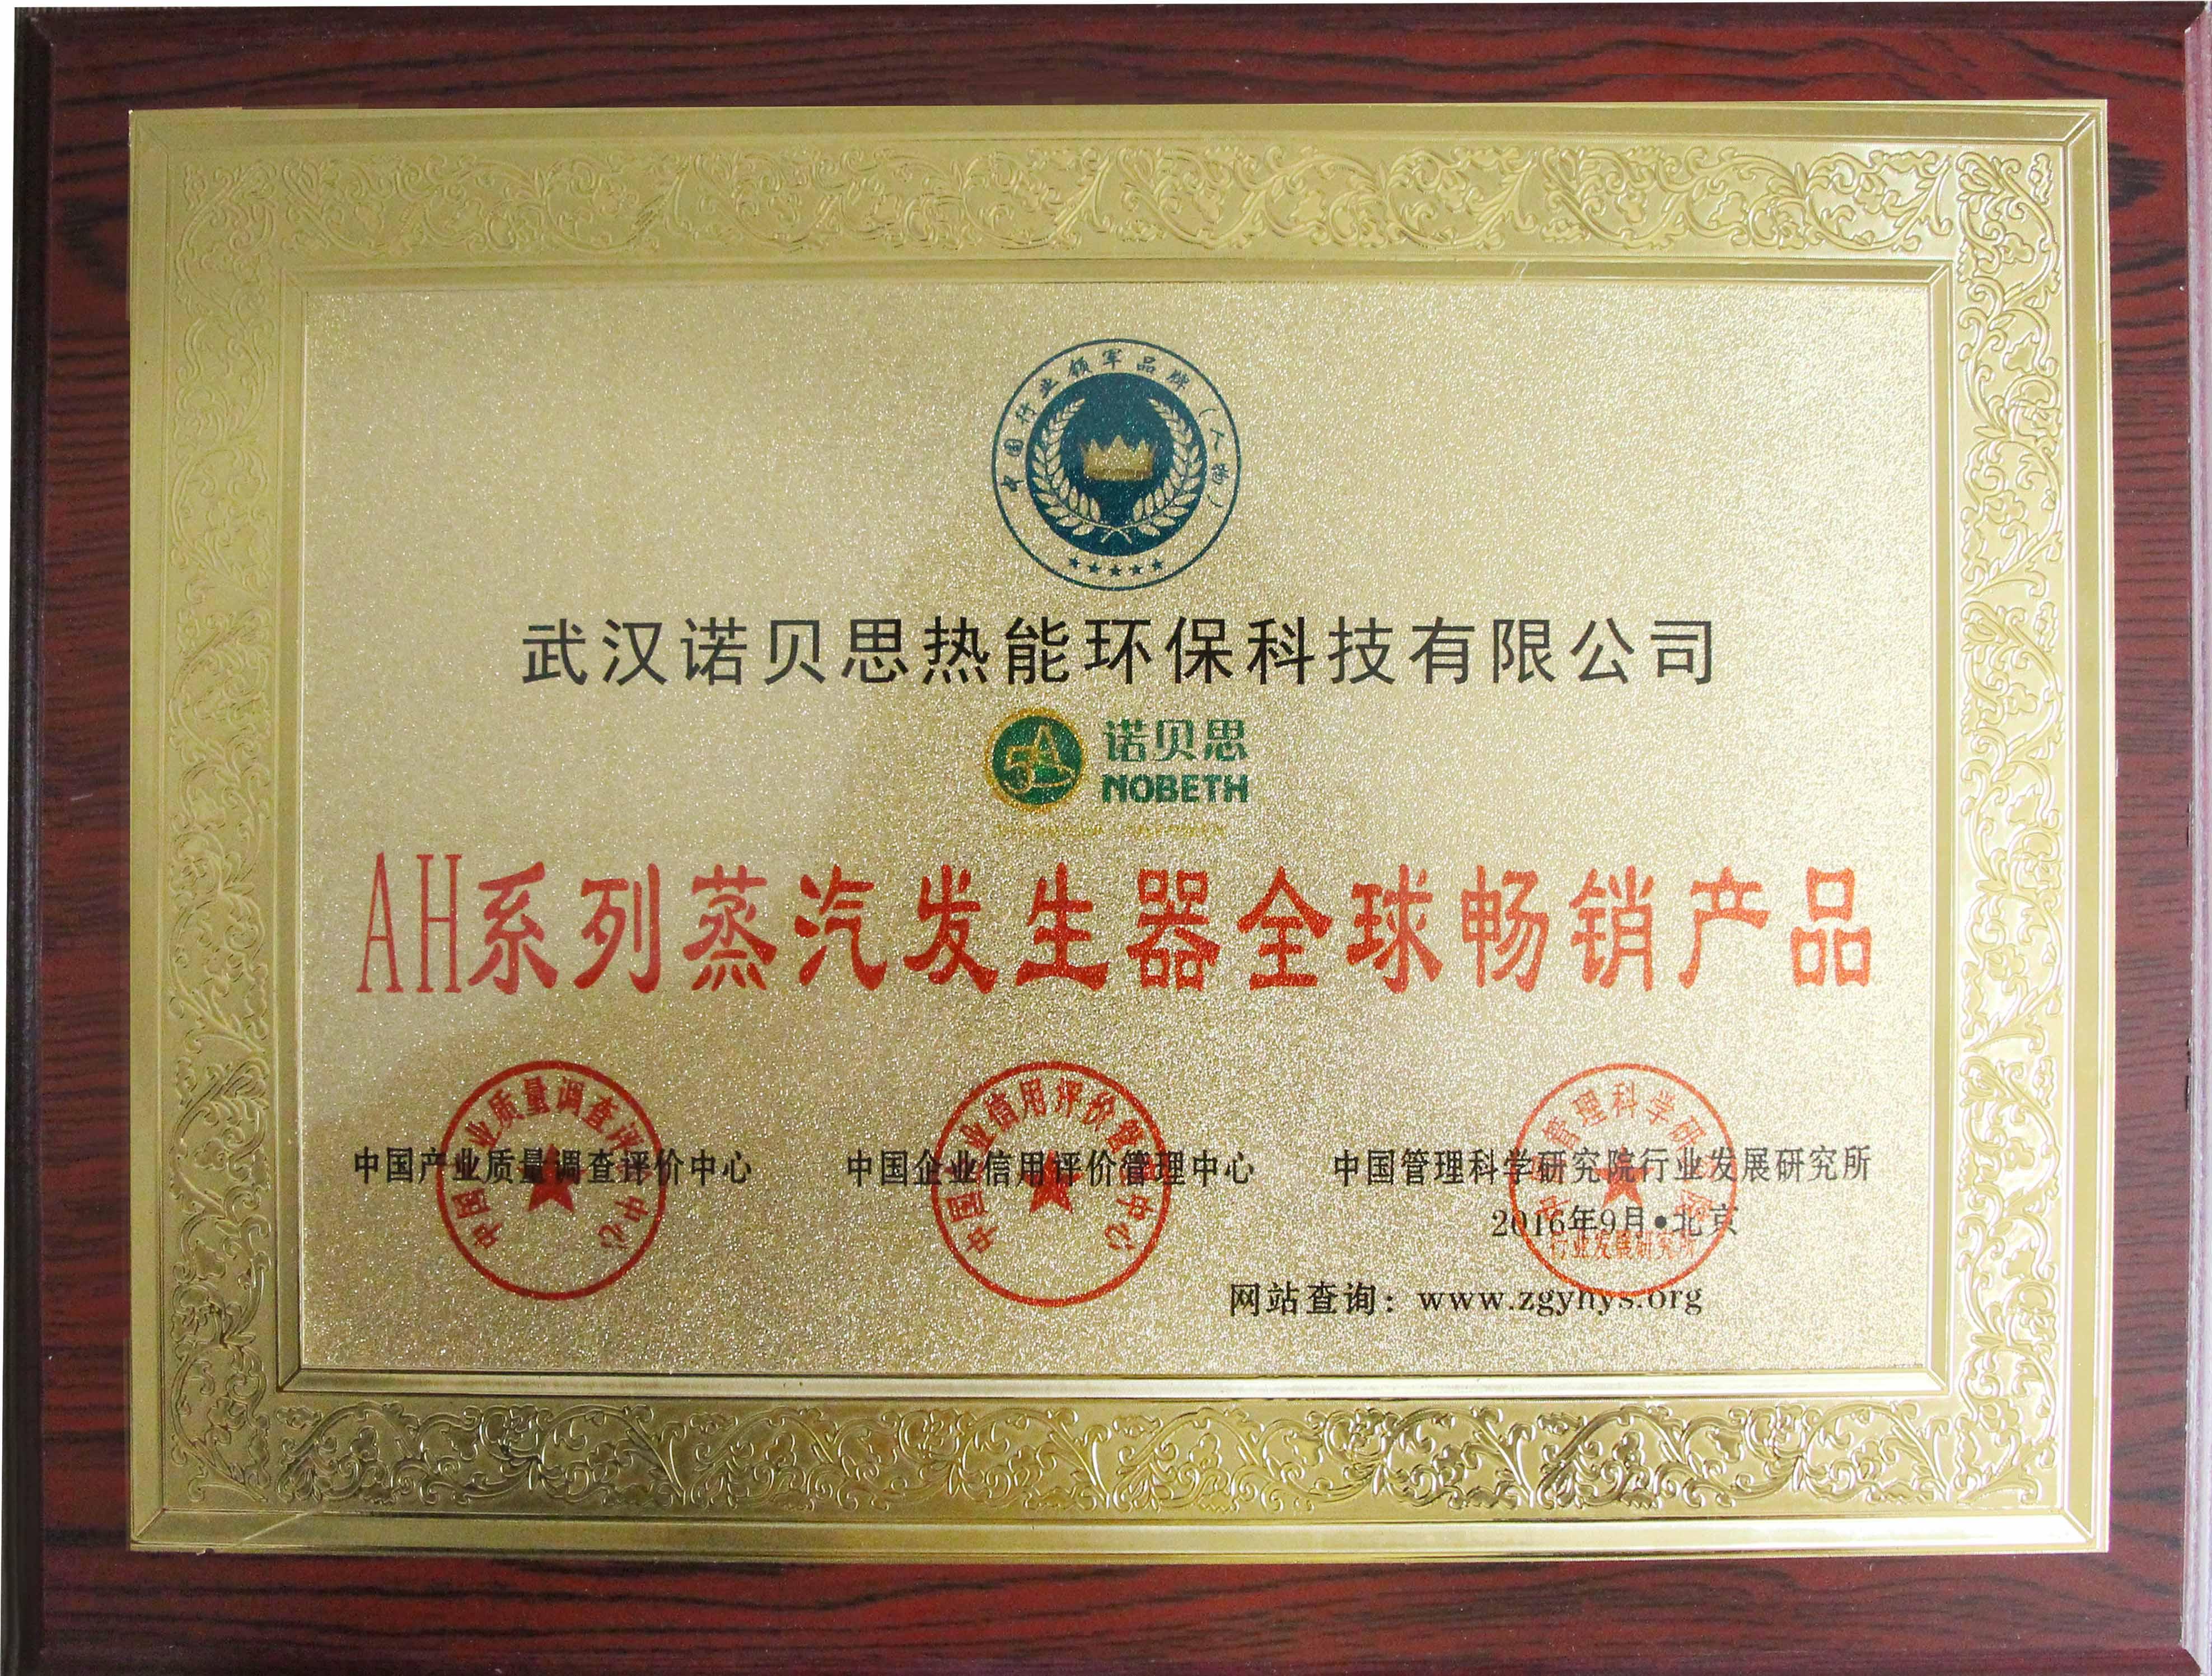 AH系列蒸汽发生器全球畅销产品